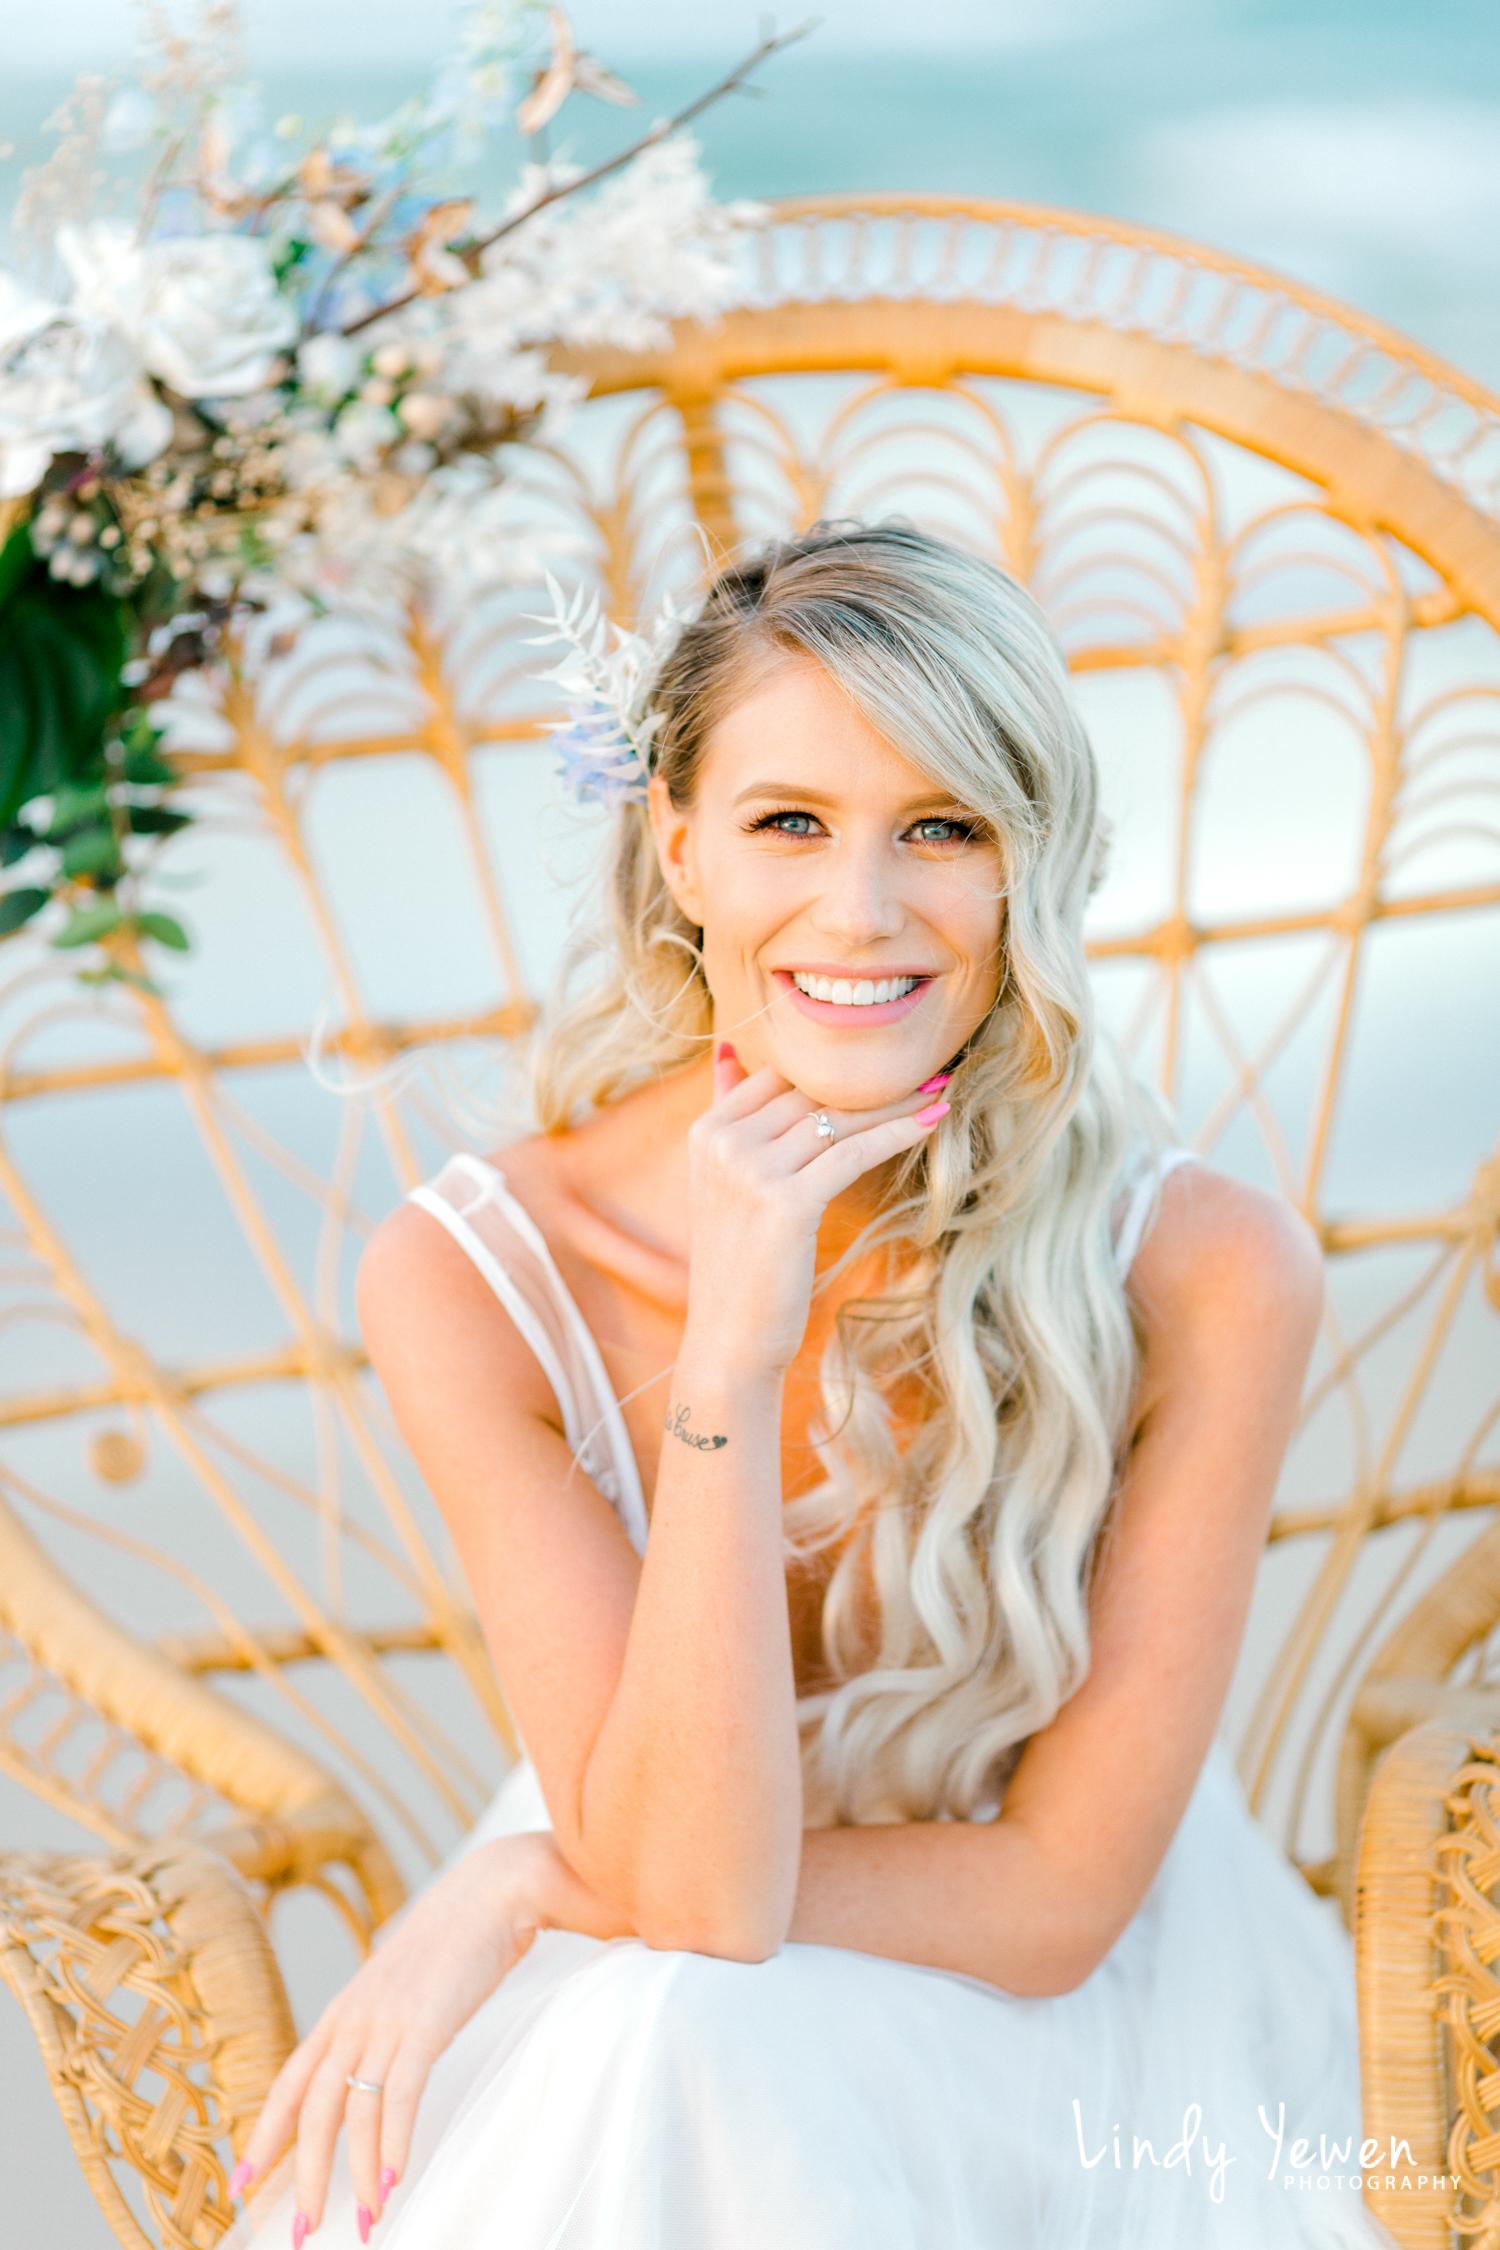 Lindy-Photography-Noosa-Weddings-Grace-Chris 190.jpg